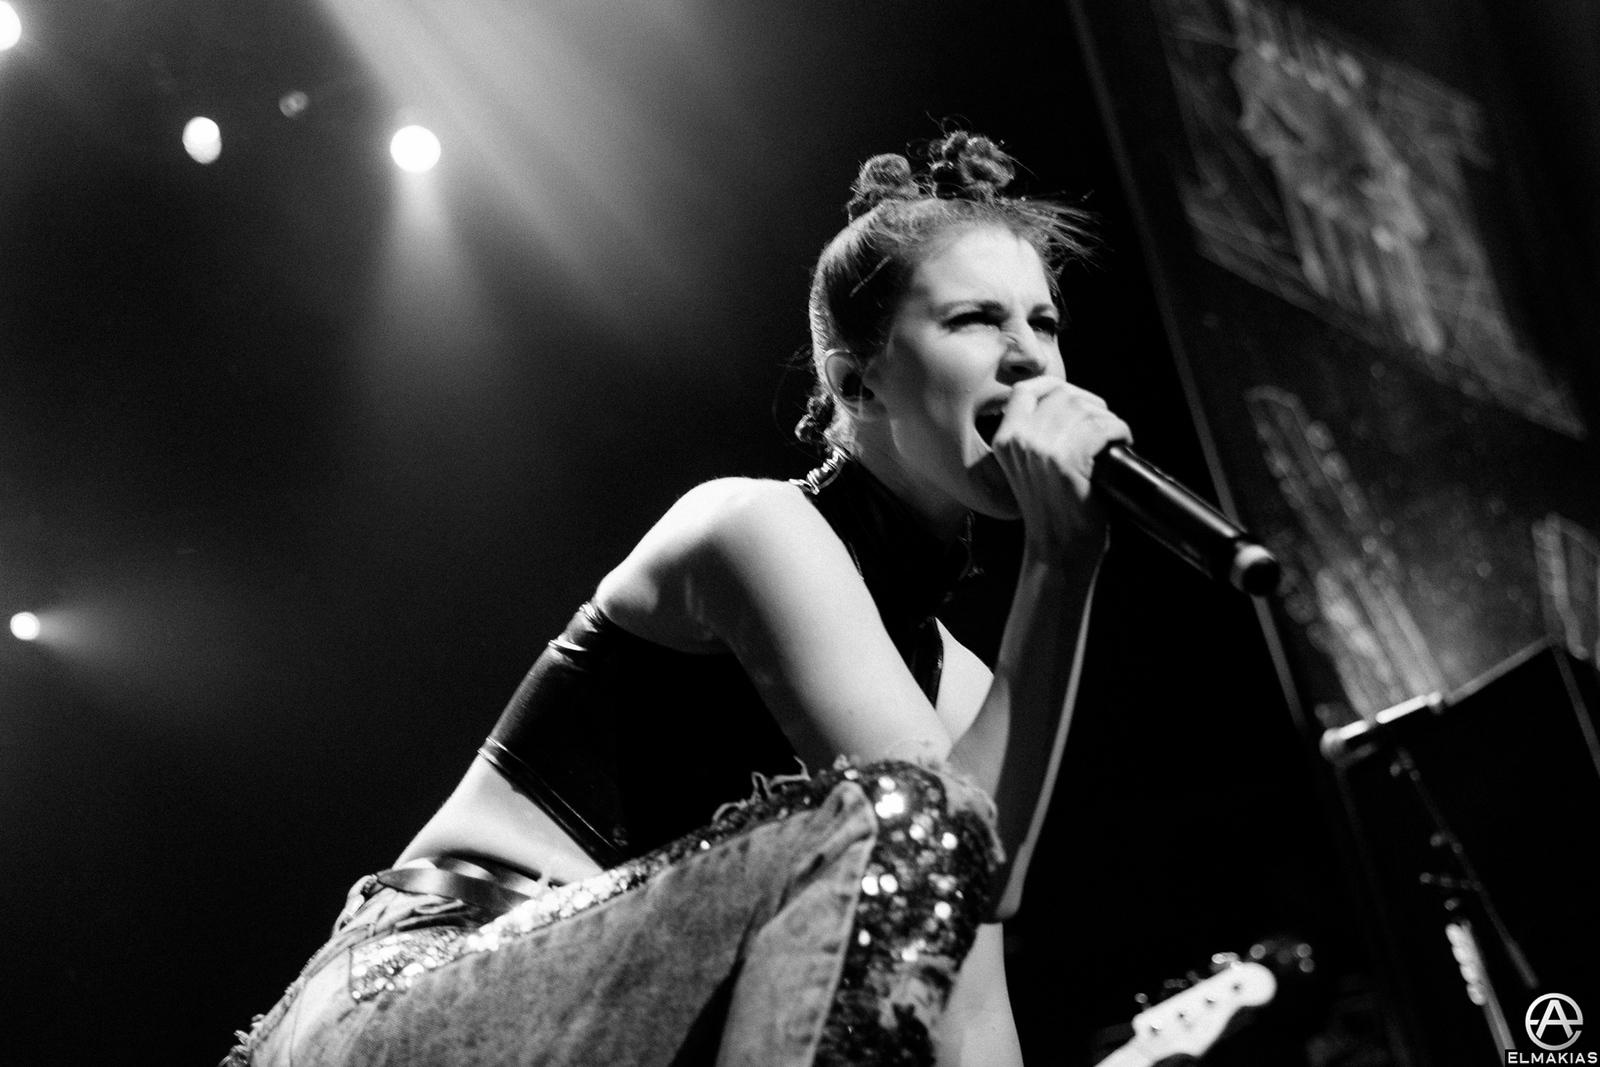 Hayley Williams of Paramore live at the Alternative Press Music Awards 2015 by Adam Elmakias